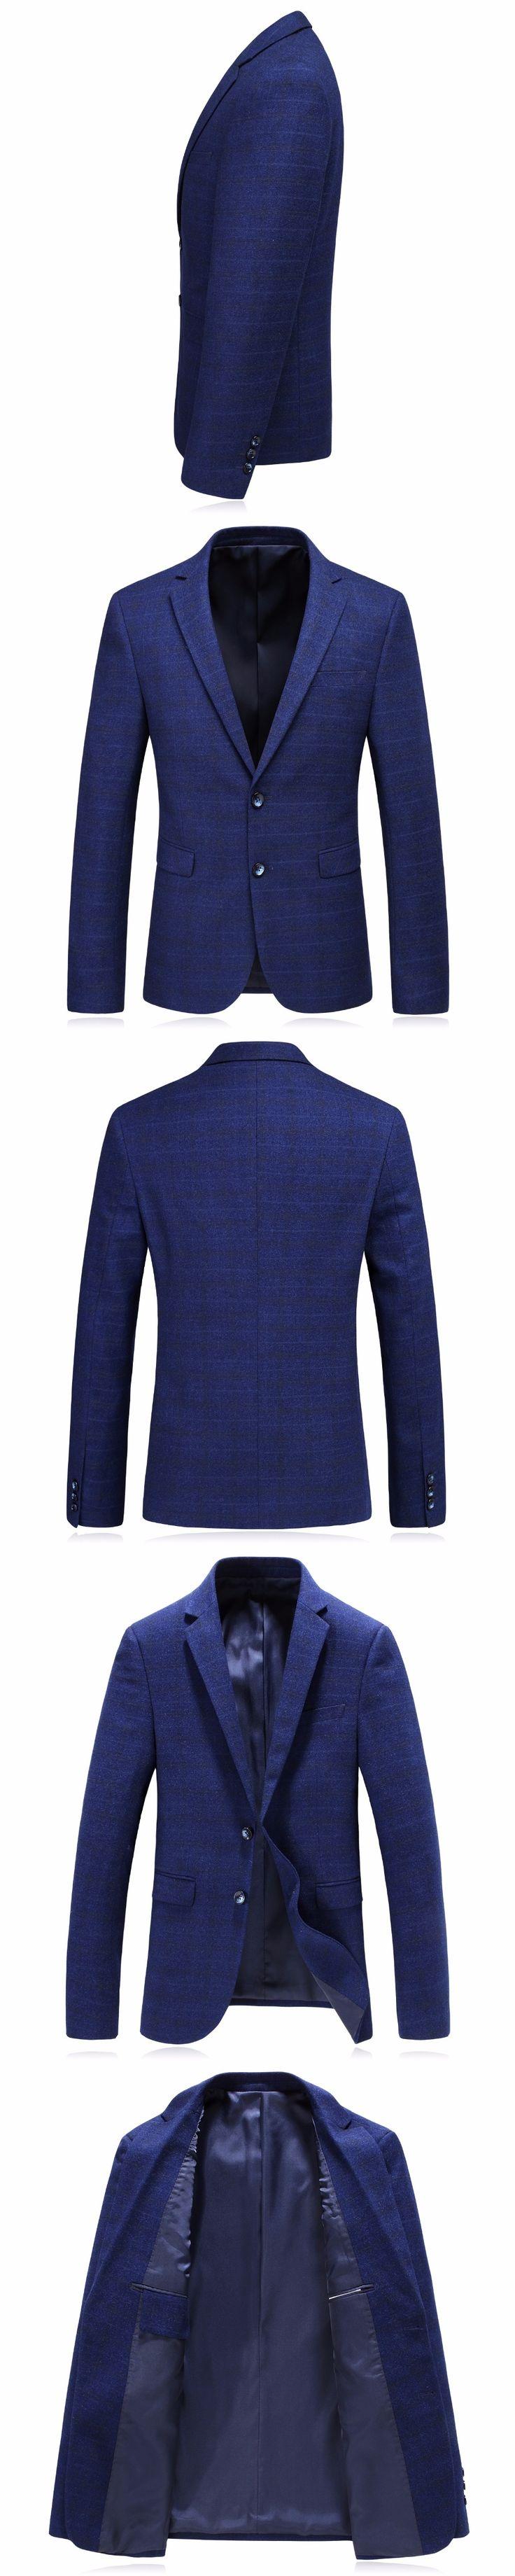 Blazer Men 2017 Luxury Blue Suit Blazer Male High Quality Stylish Autumn Jacket Mens Plaid Casual Coat Slim Fit Costume M-3XL